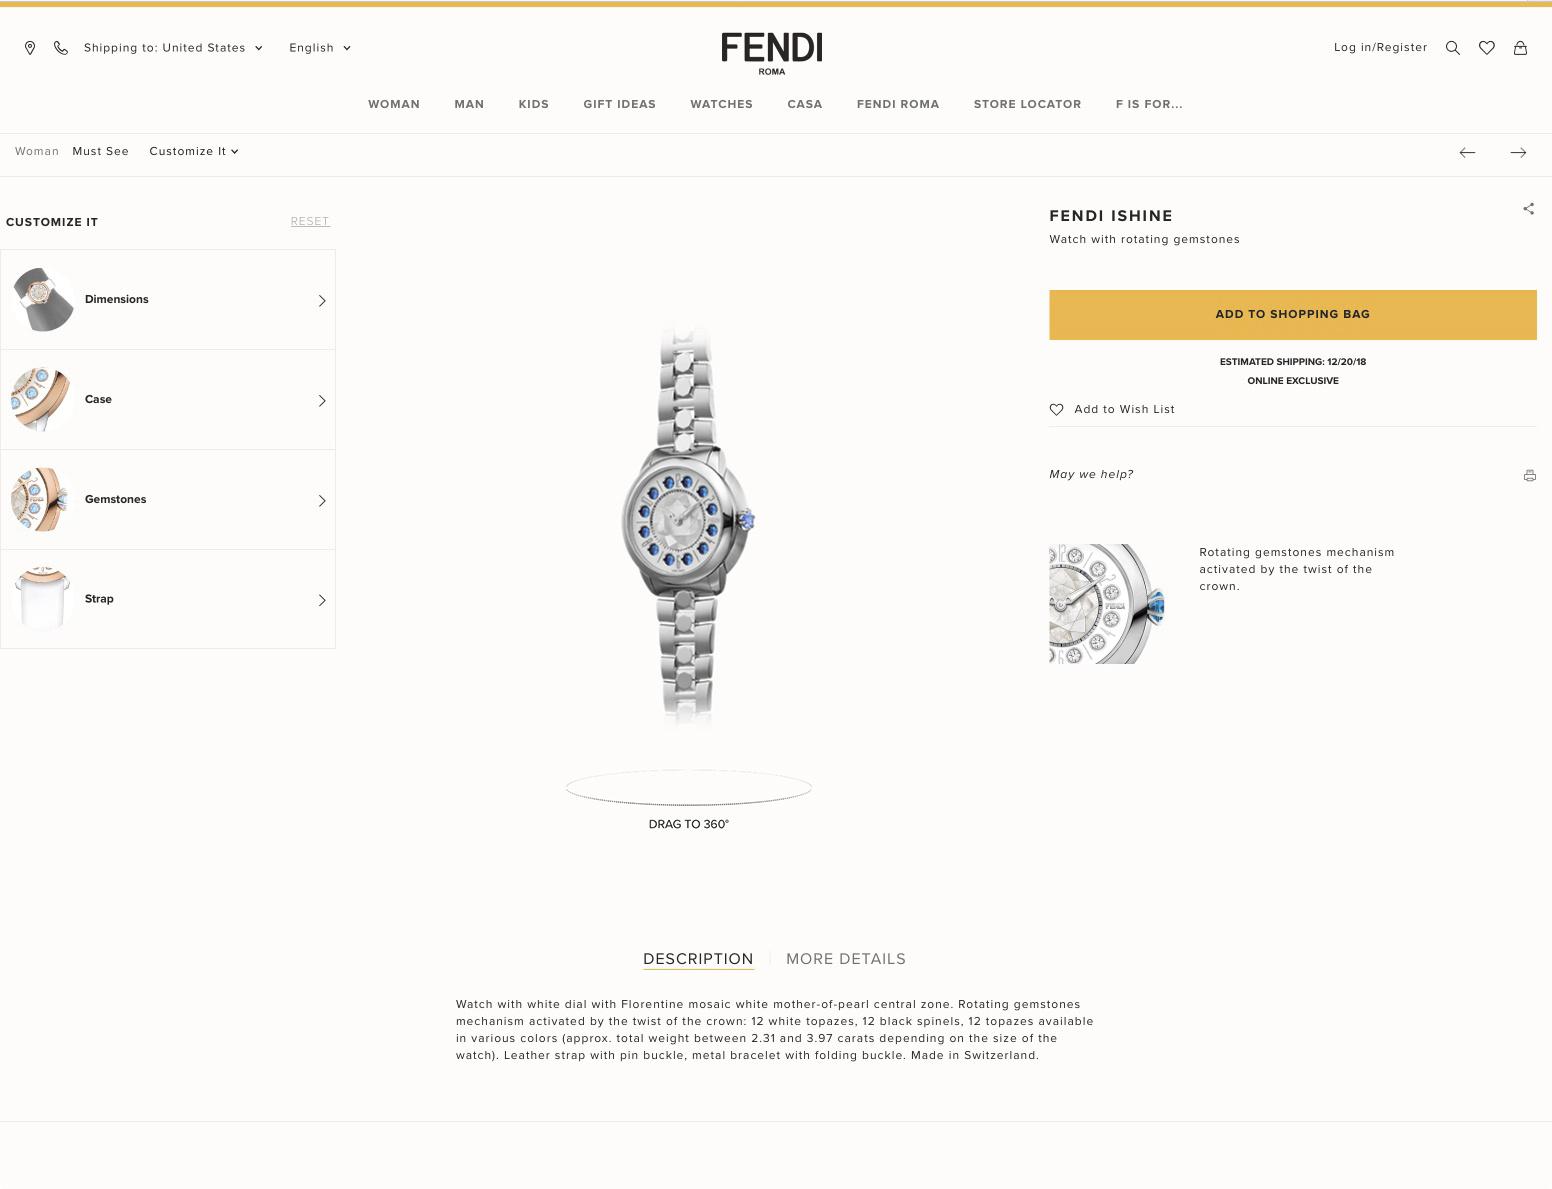 Fendi IShine Customization